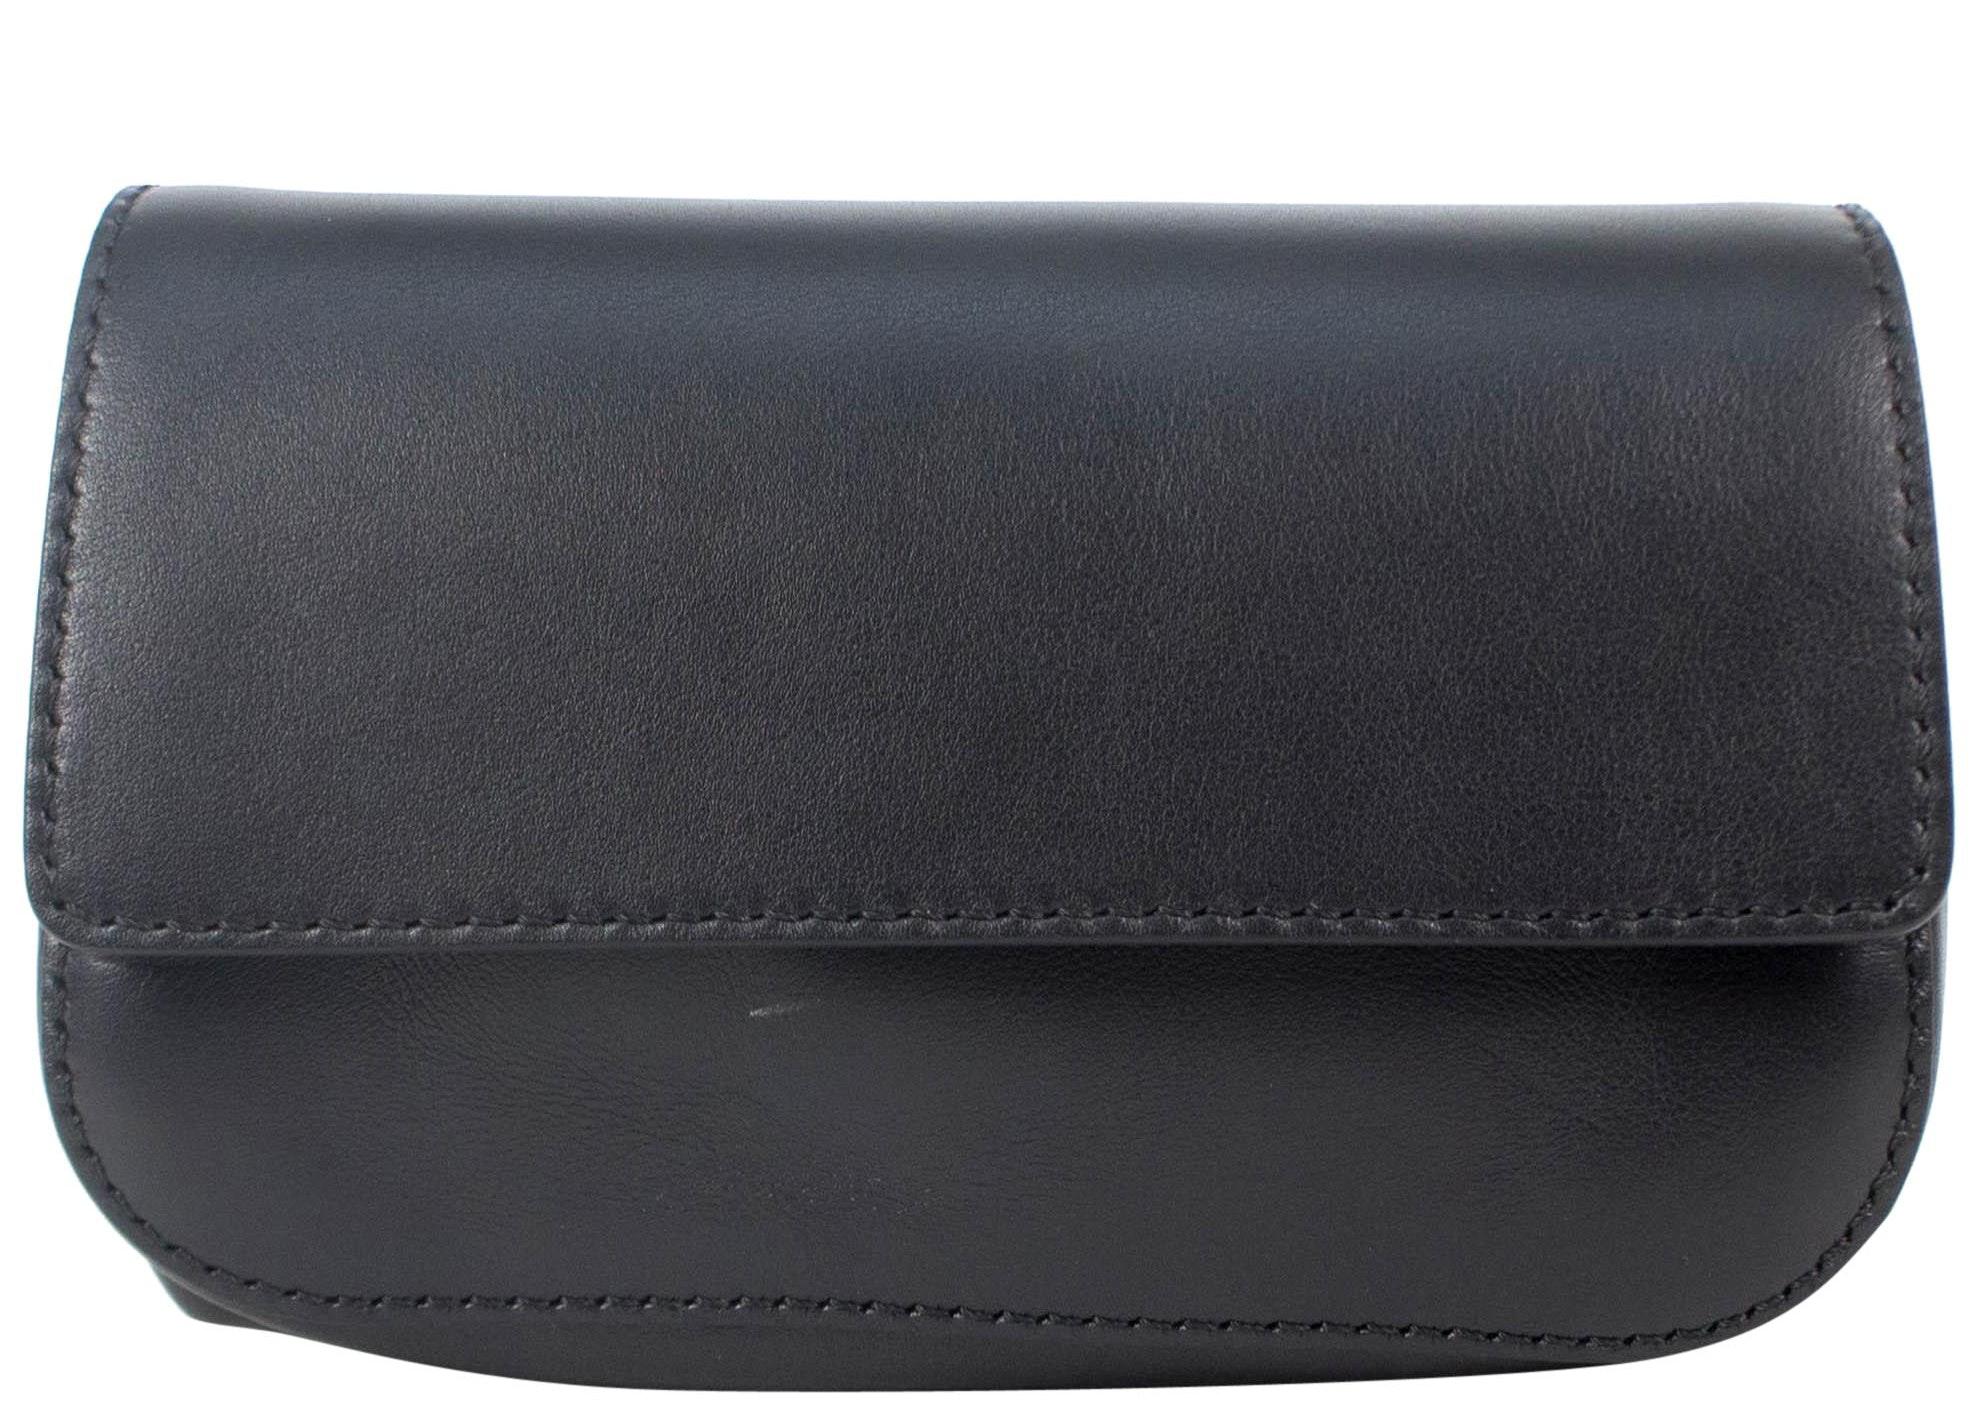 Valentino Belt Bag Black